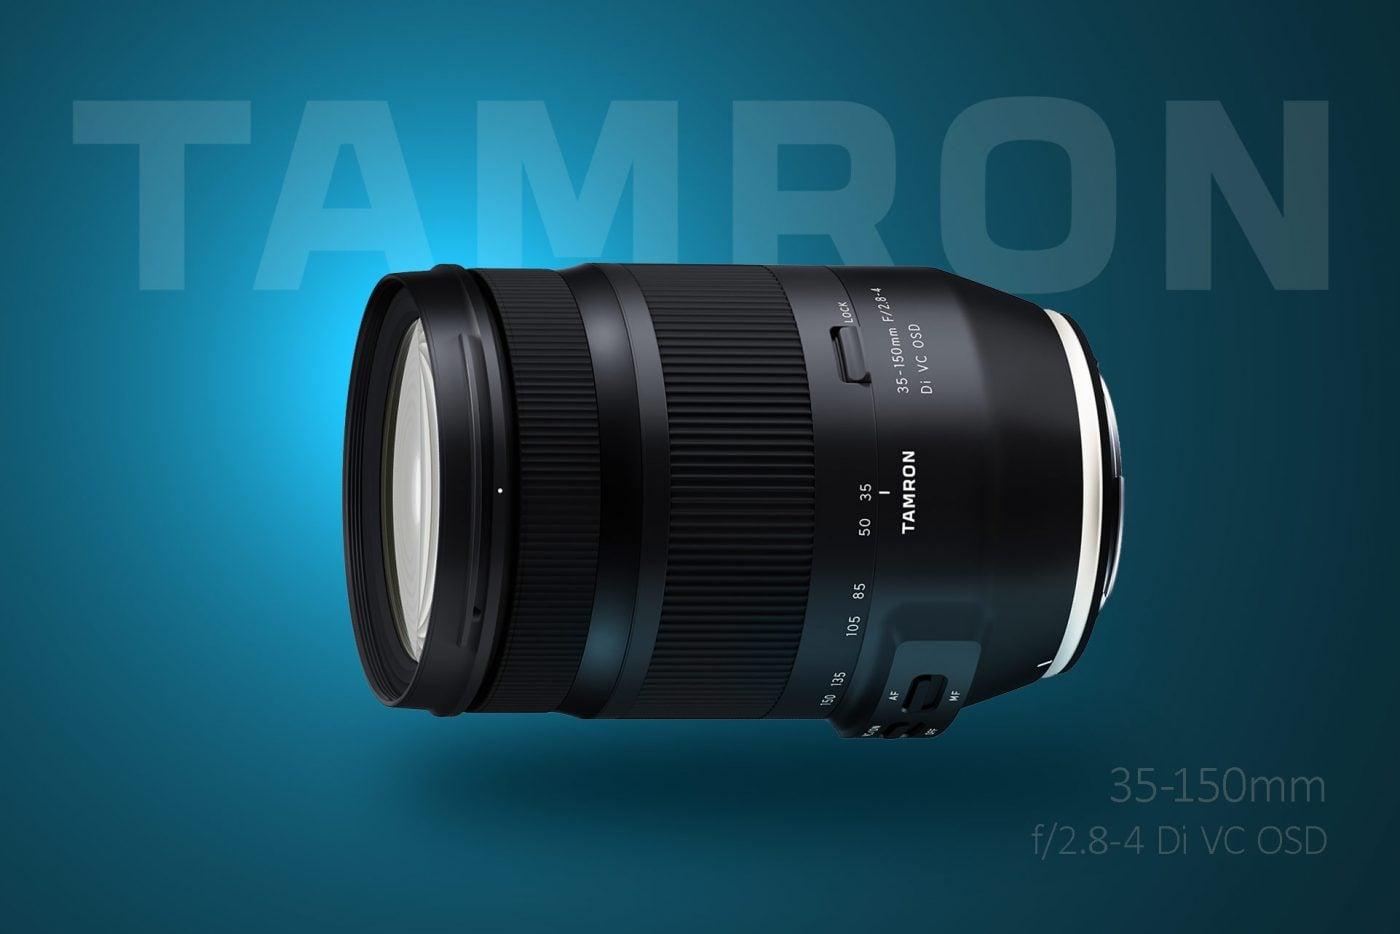 Tamron 35-150 f/2.8-4 Price announced